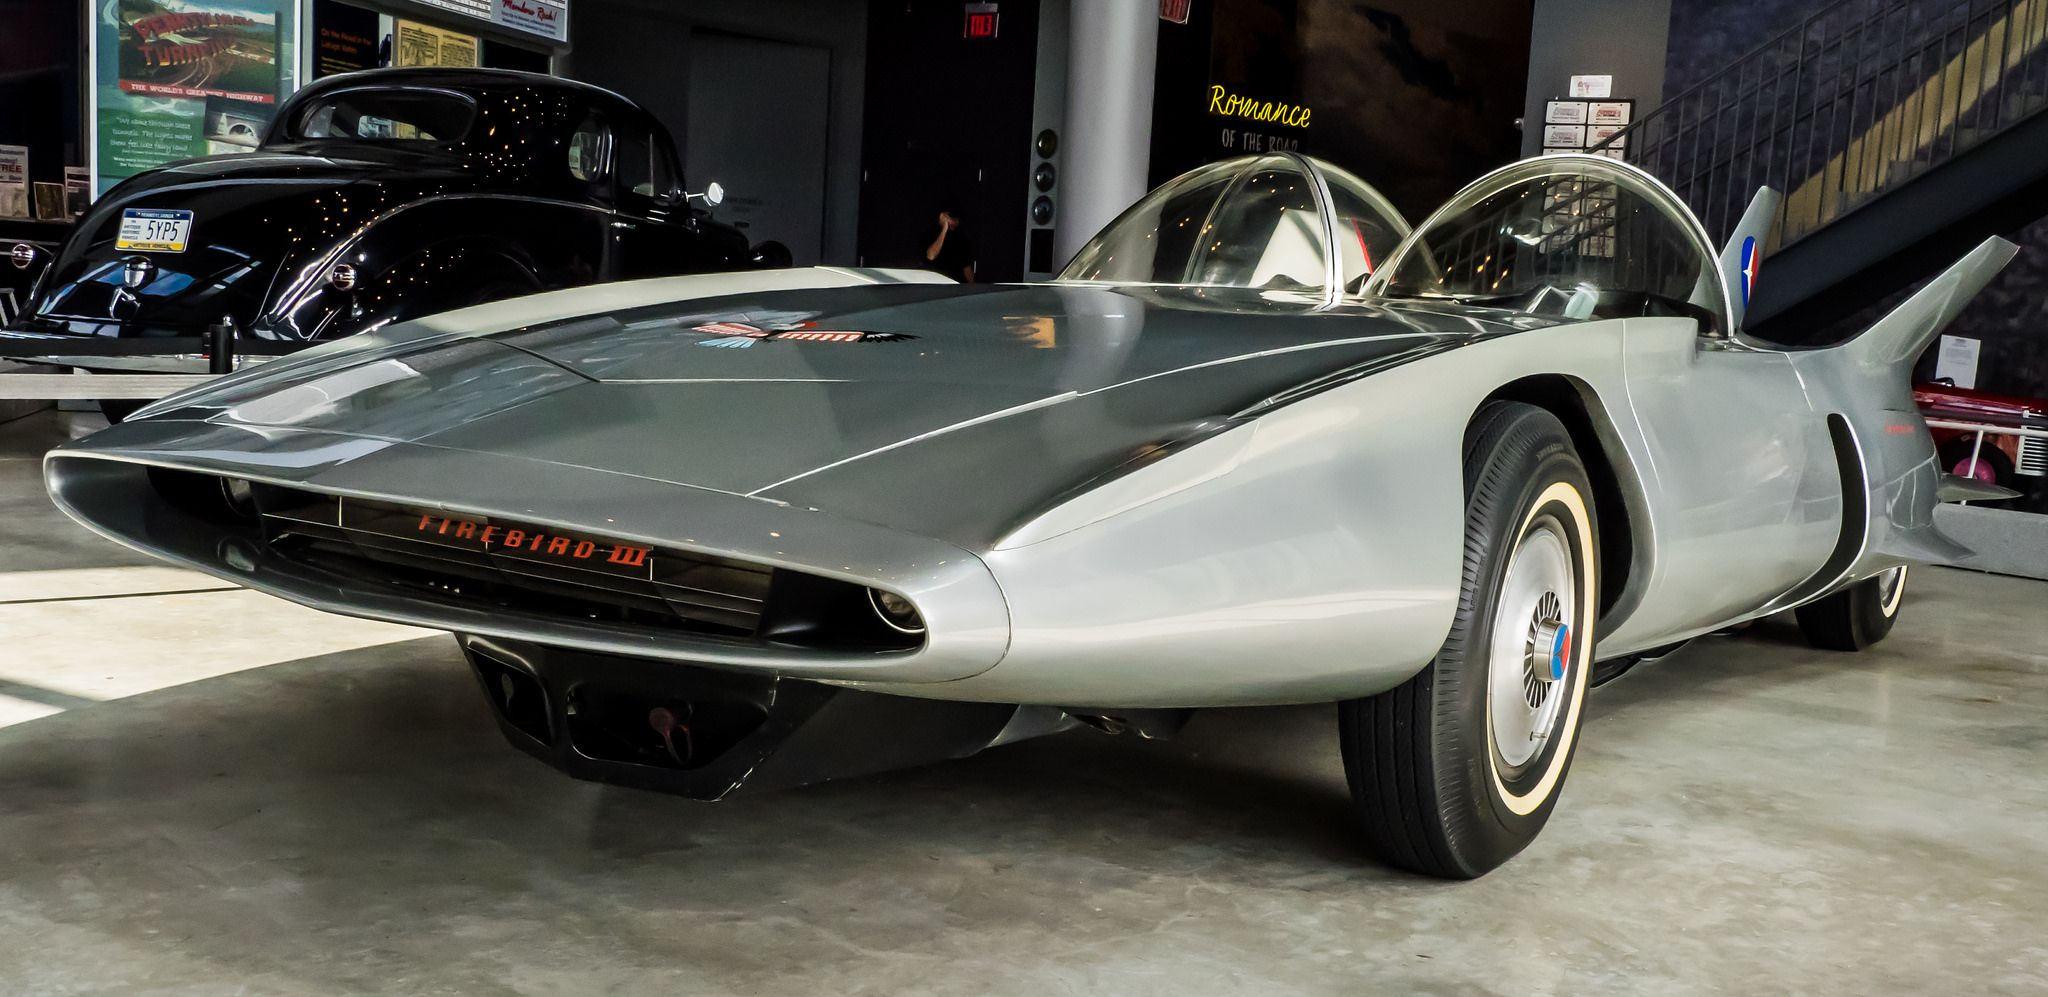 gm s firebird iii concept car vintage cars pinterest cars